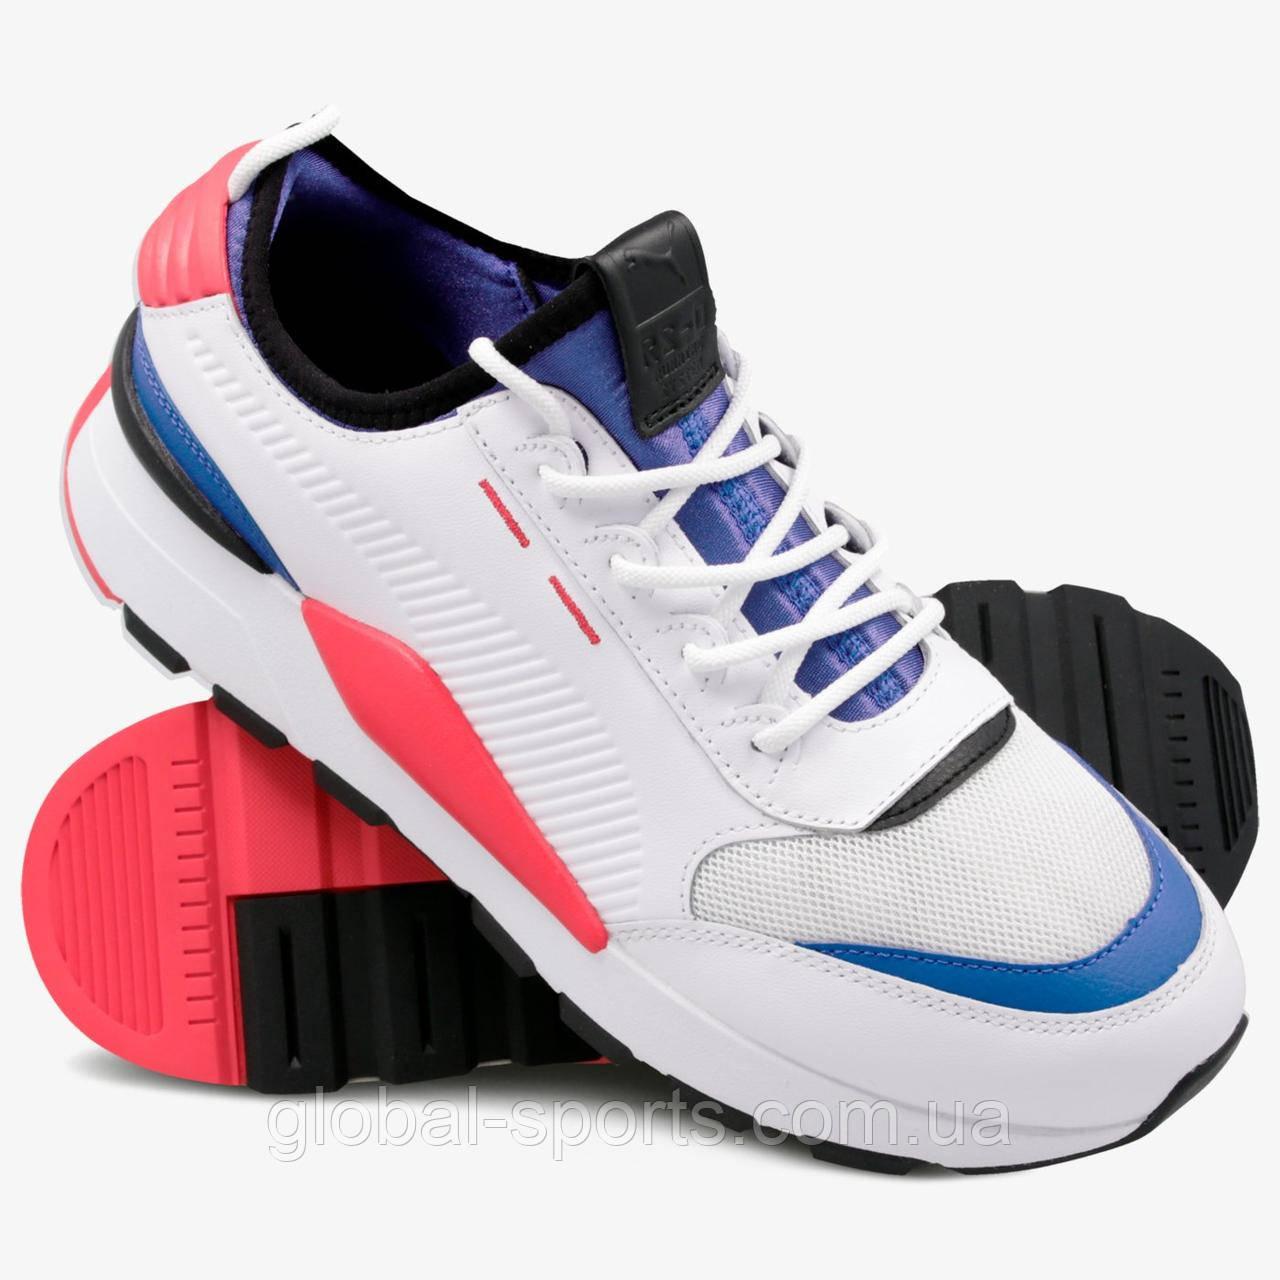 Мужские кроссовки Puma Rs-0 Sound (Артикул: 36689001)